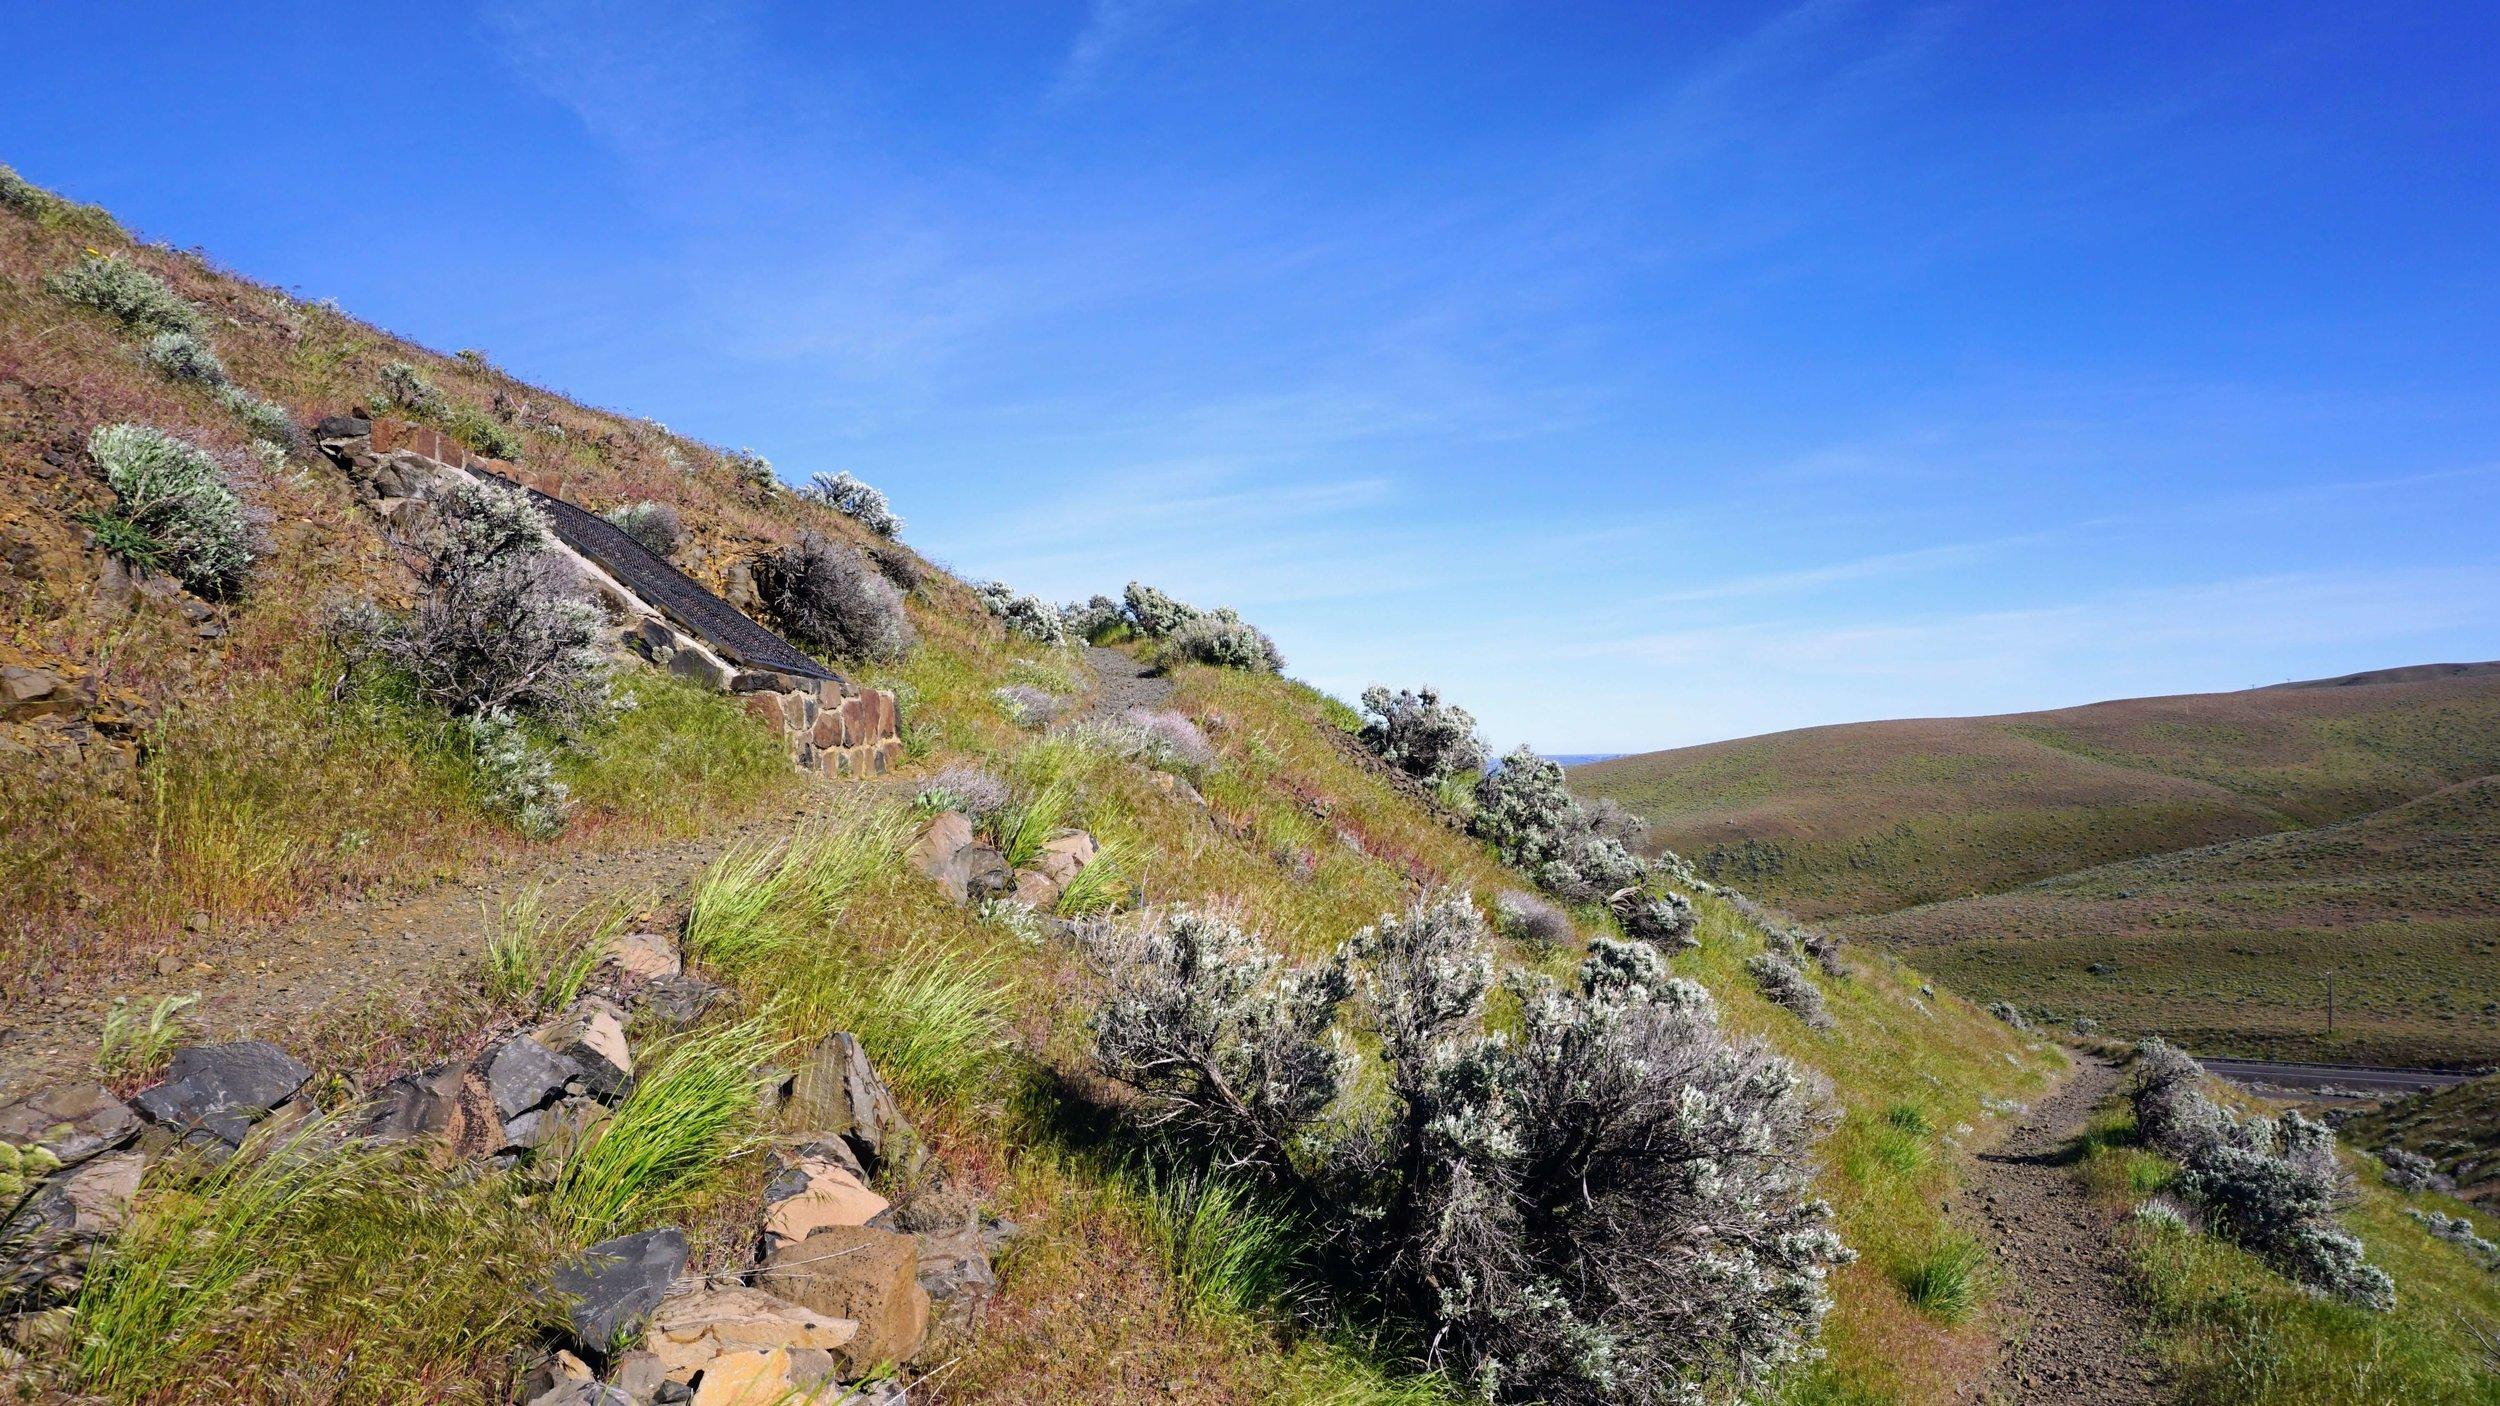 Trees of Stone Interpretive Trail